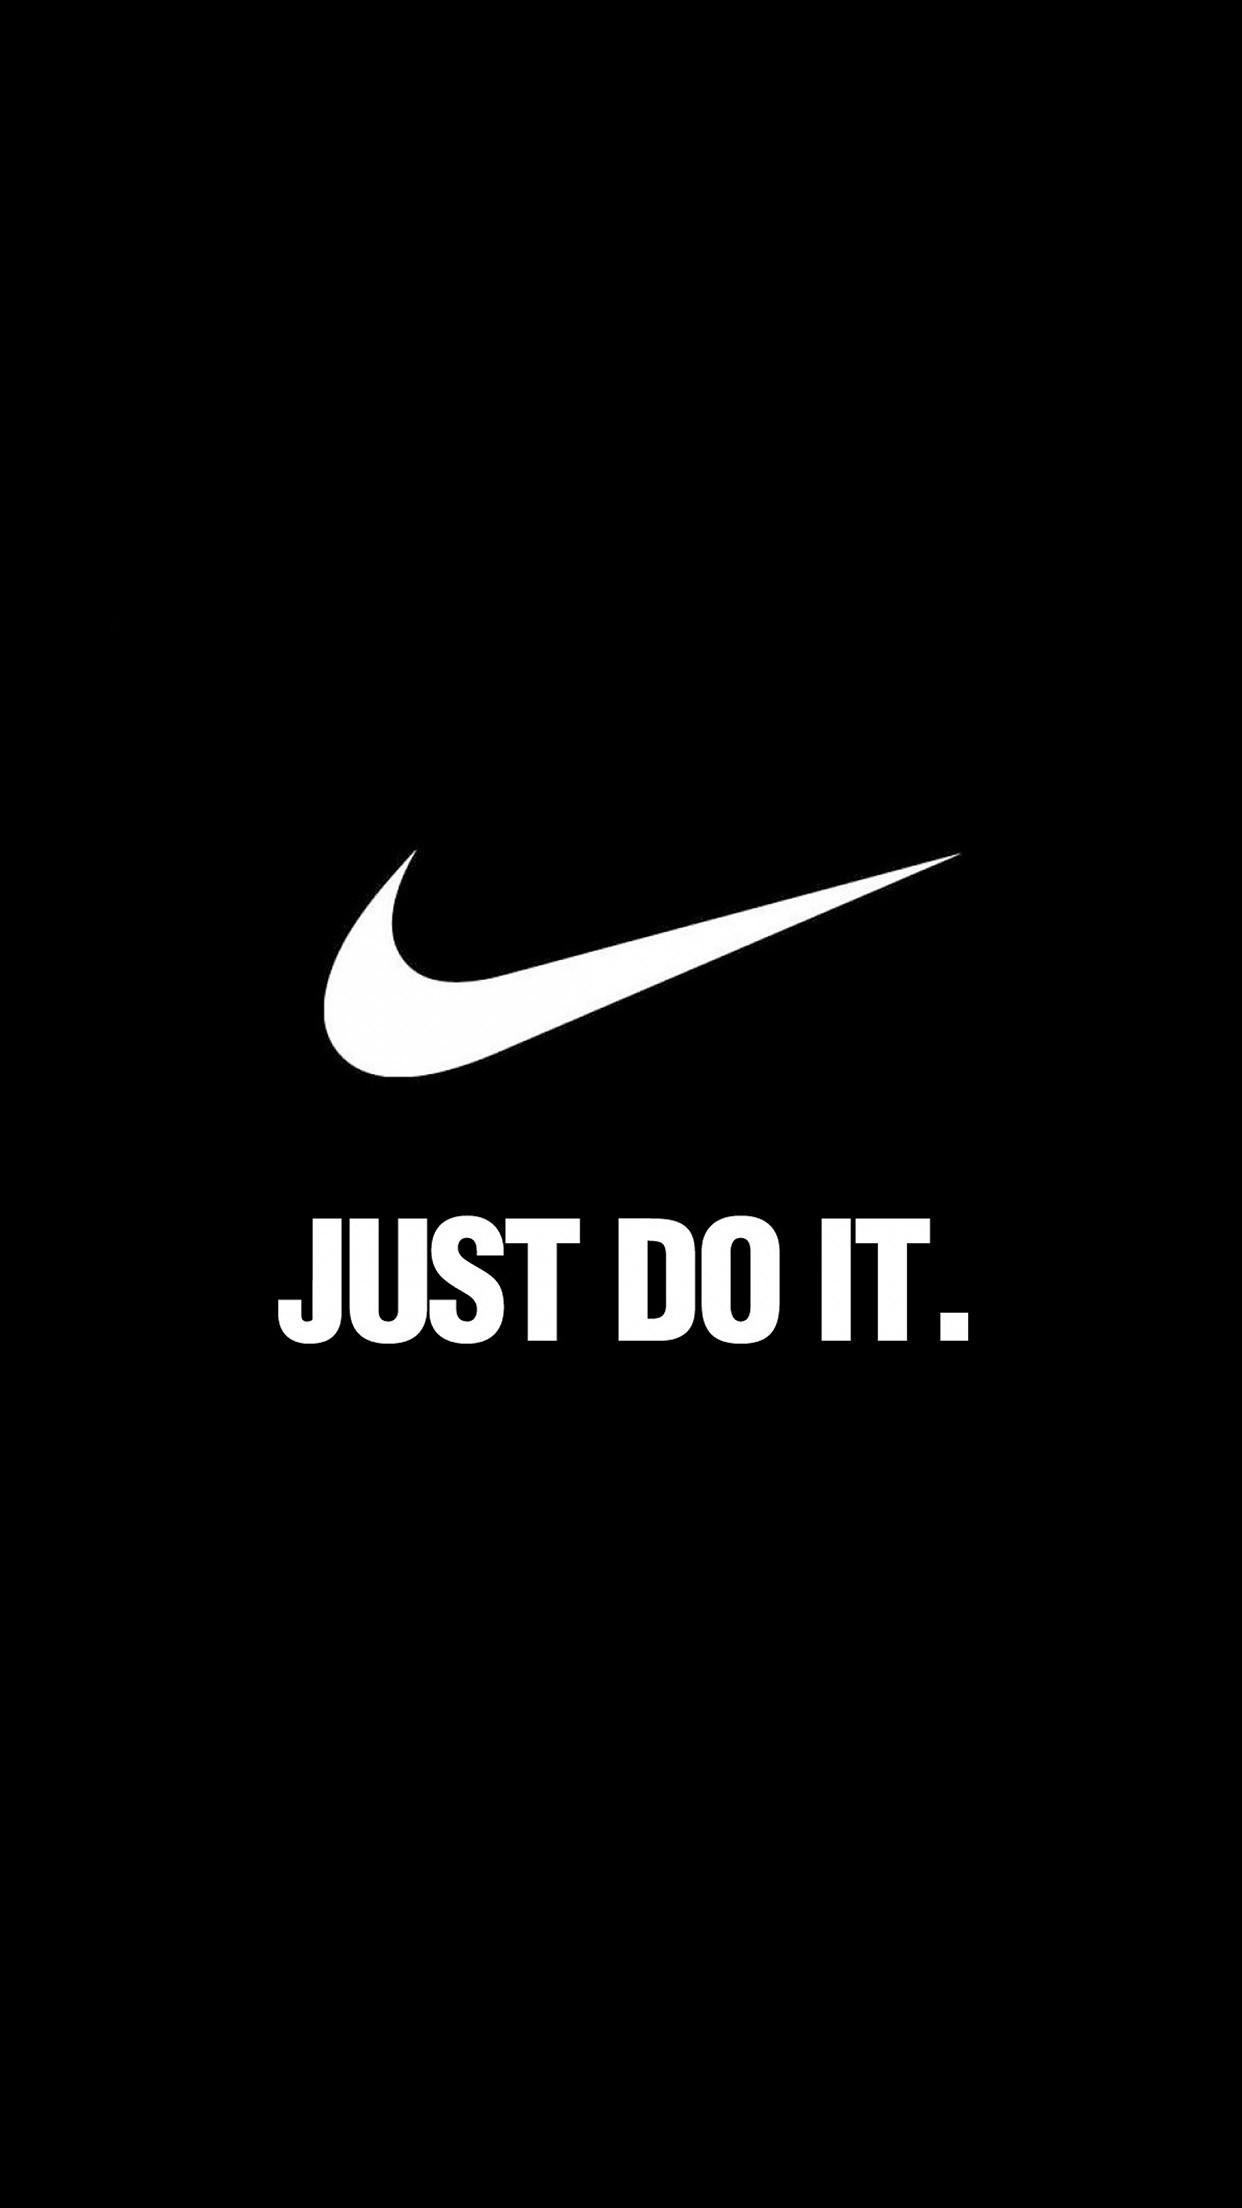 Logo Nike Brand Just Do It Motivation · Nike Wallpaper IphoneIphone …